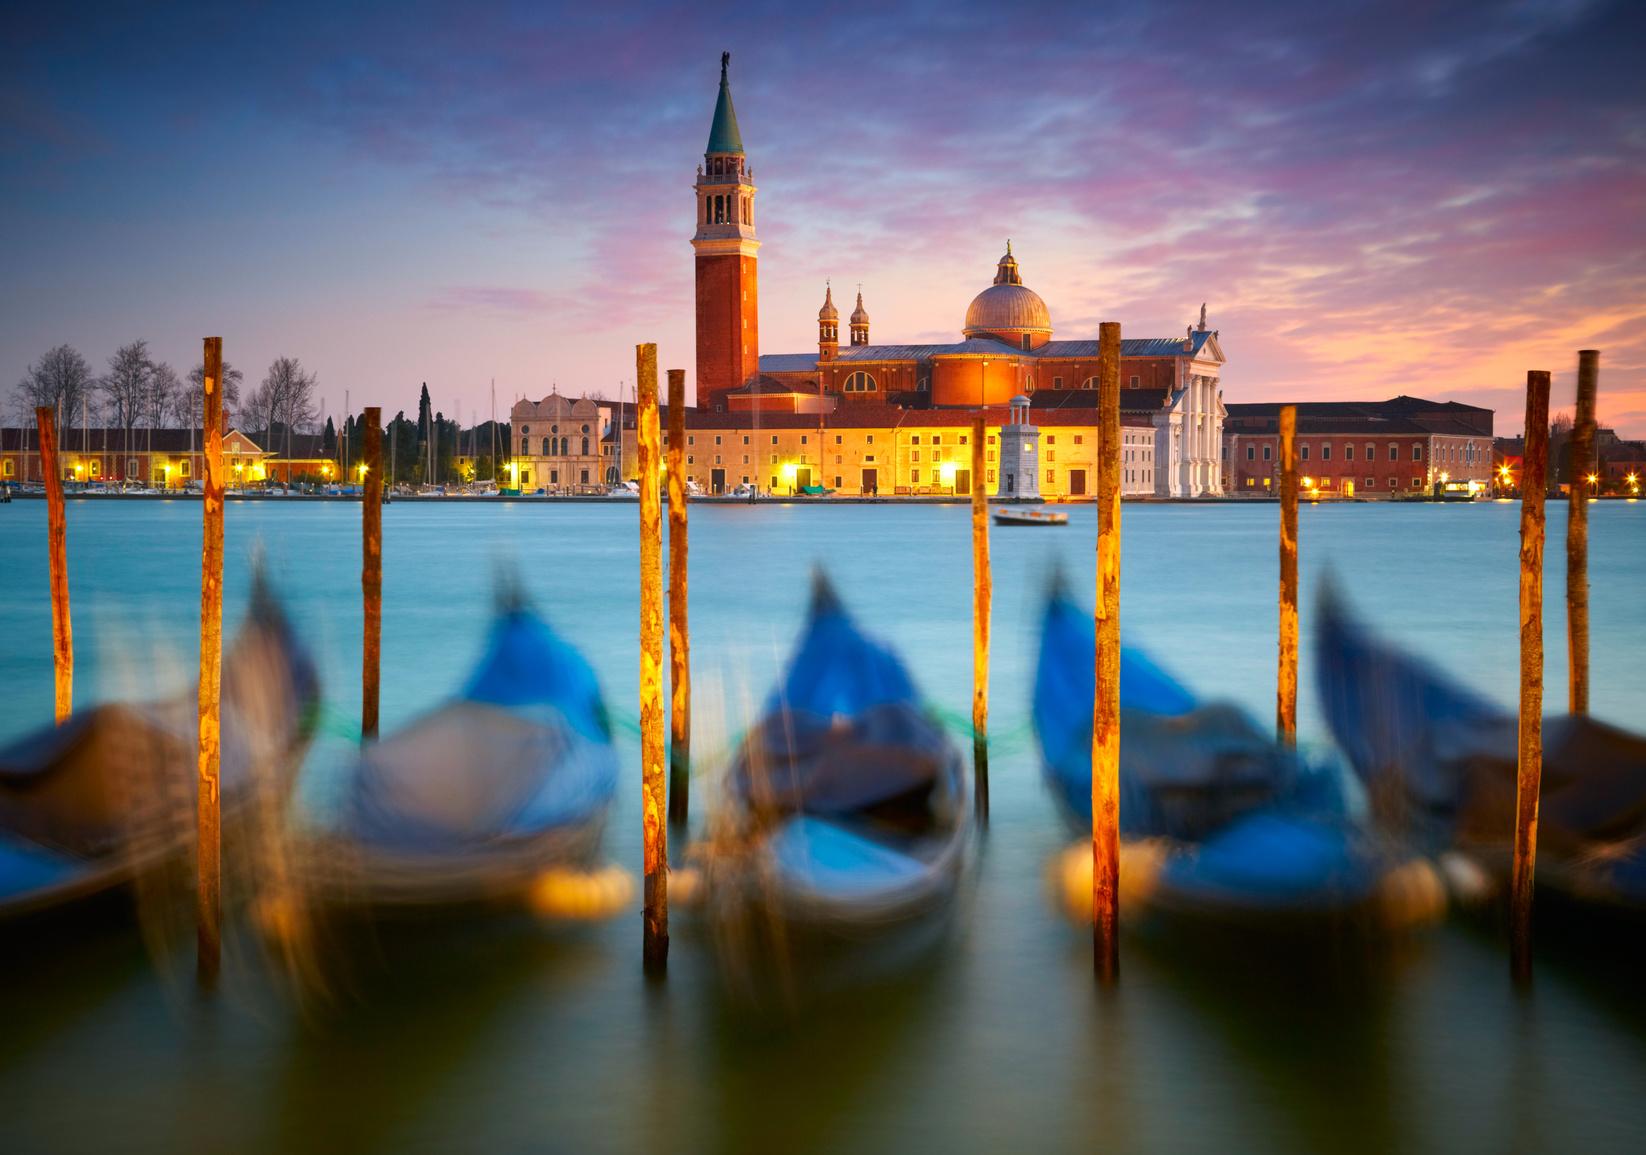 Weekend Wallpaper Hd Venise Nos 10 Coups De C Ur Id 233 Es Week End Italie